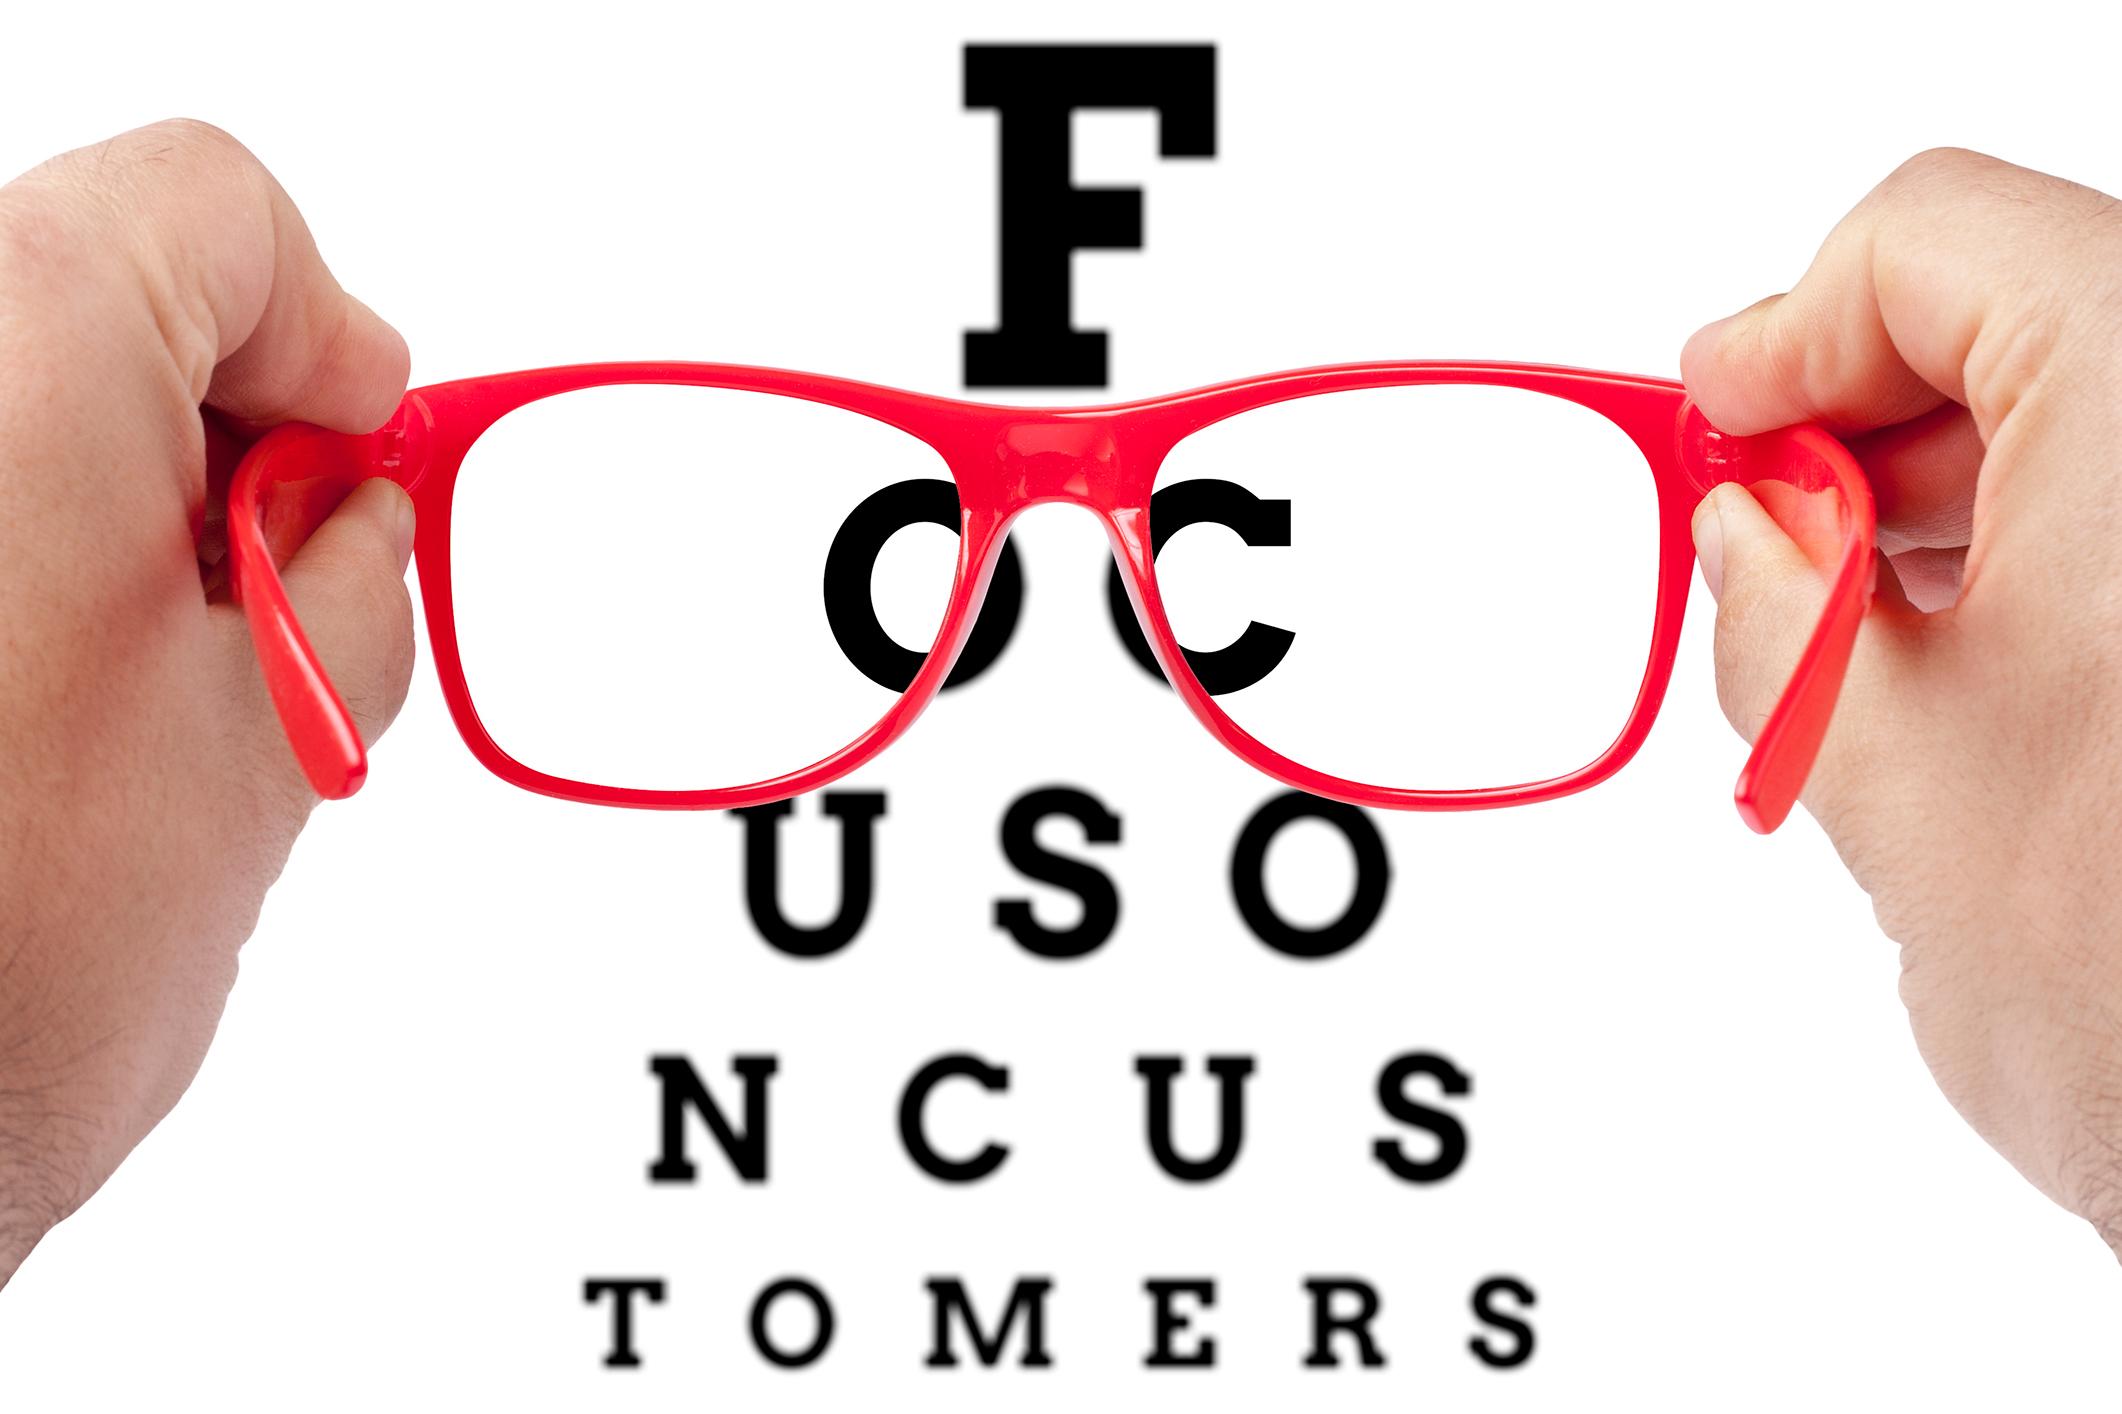 focus-customer